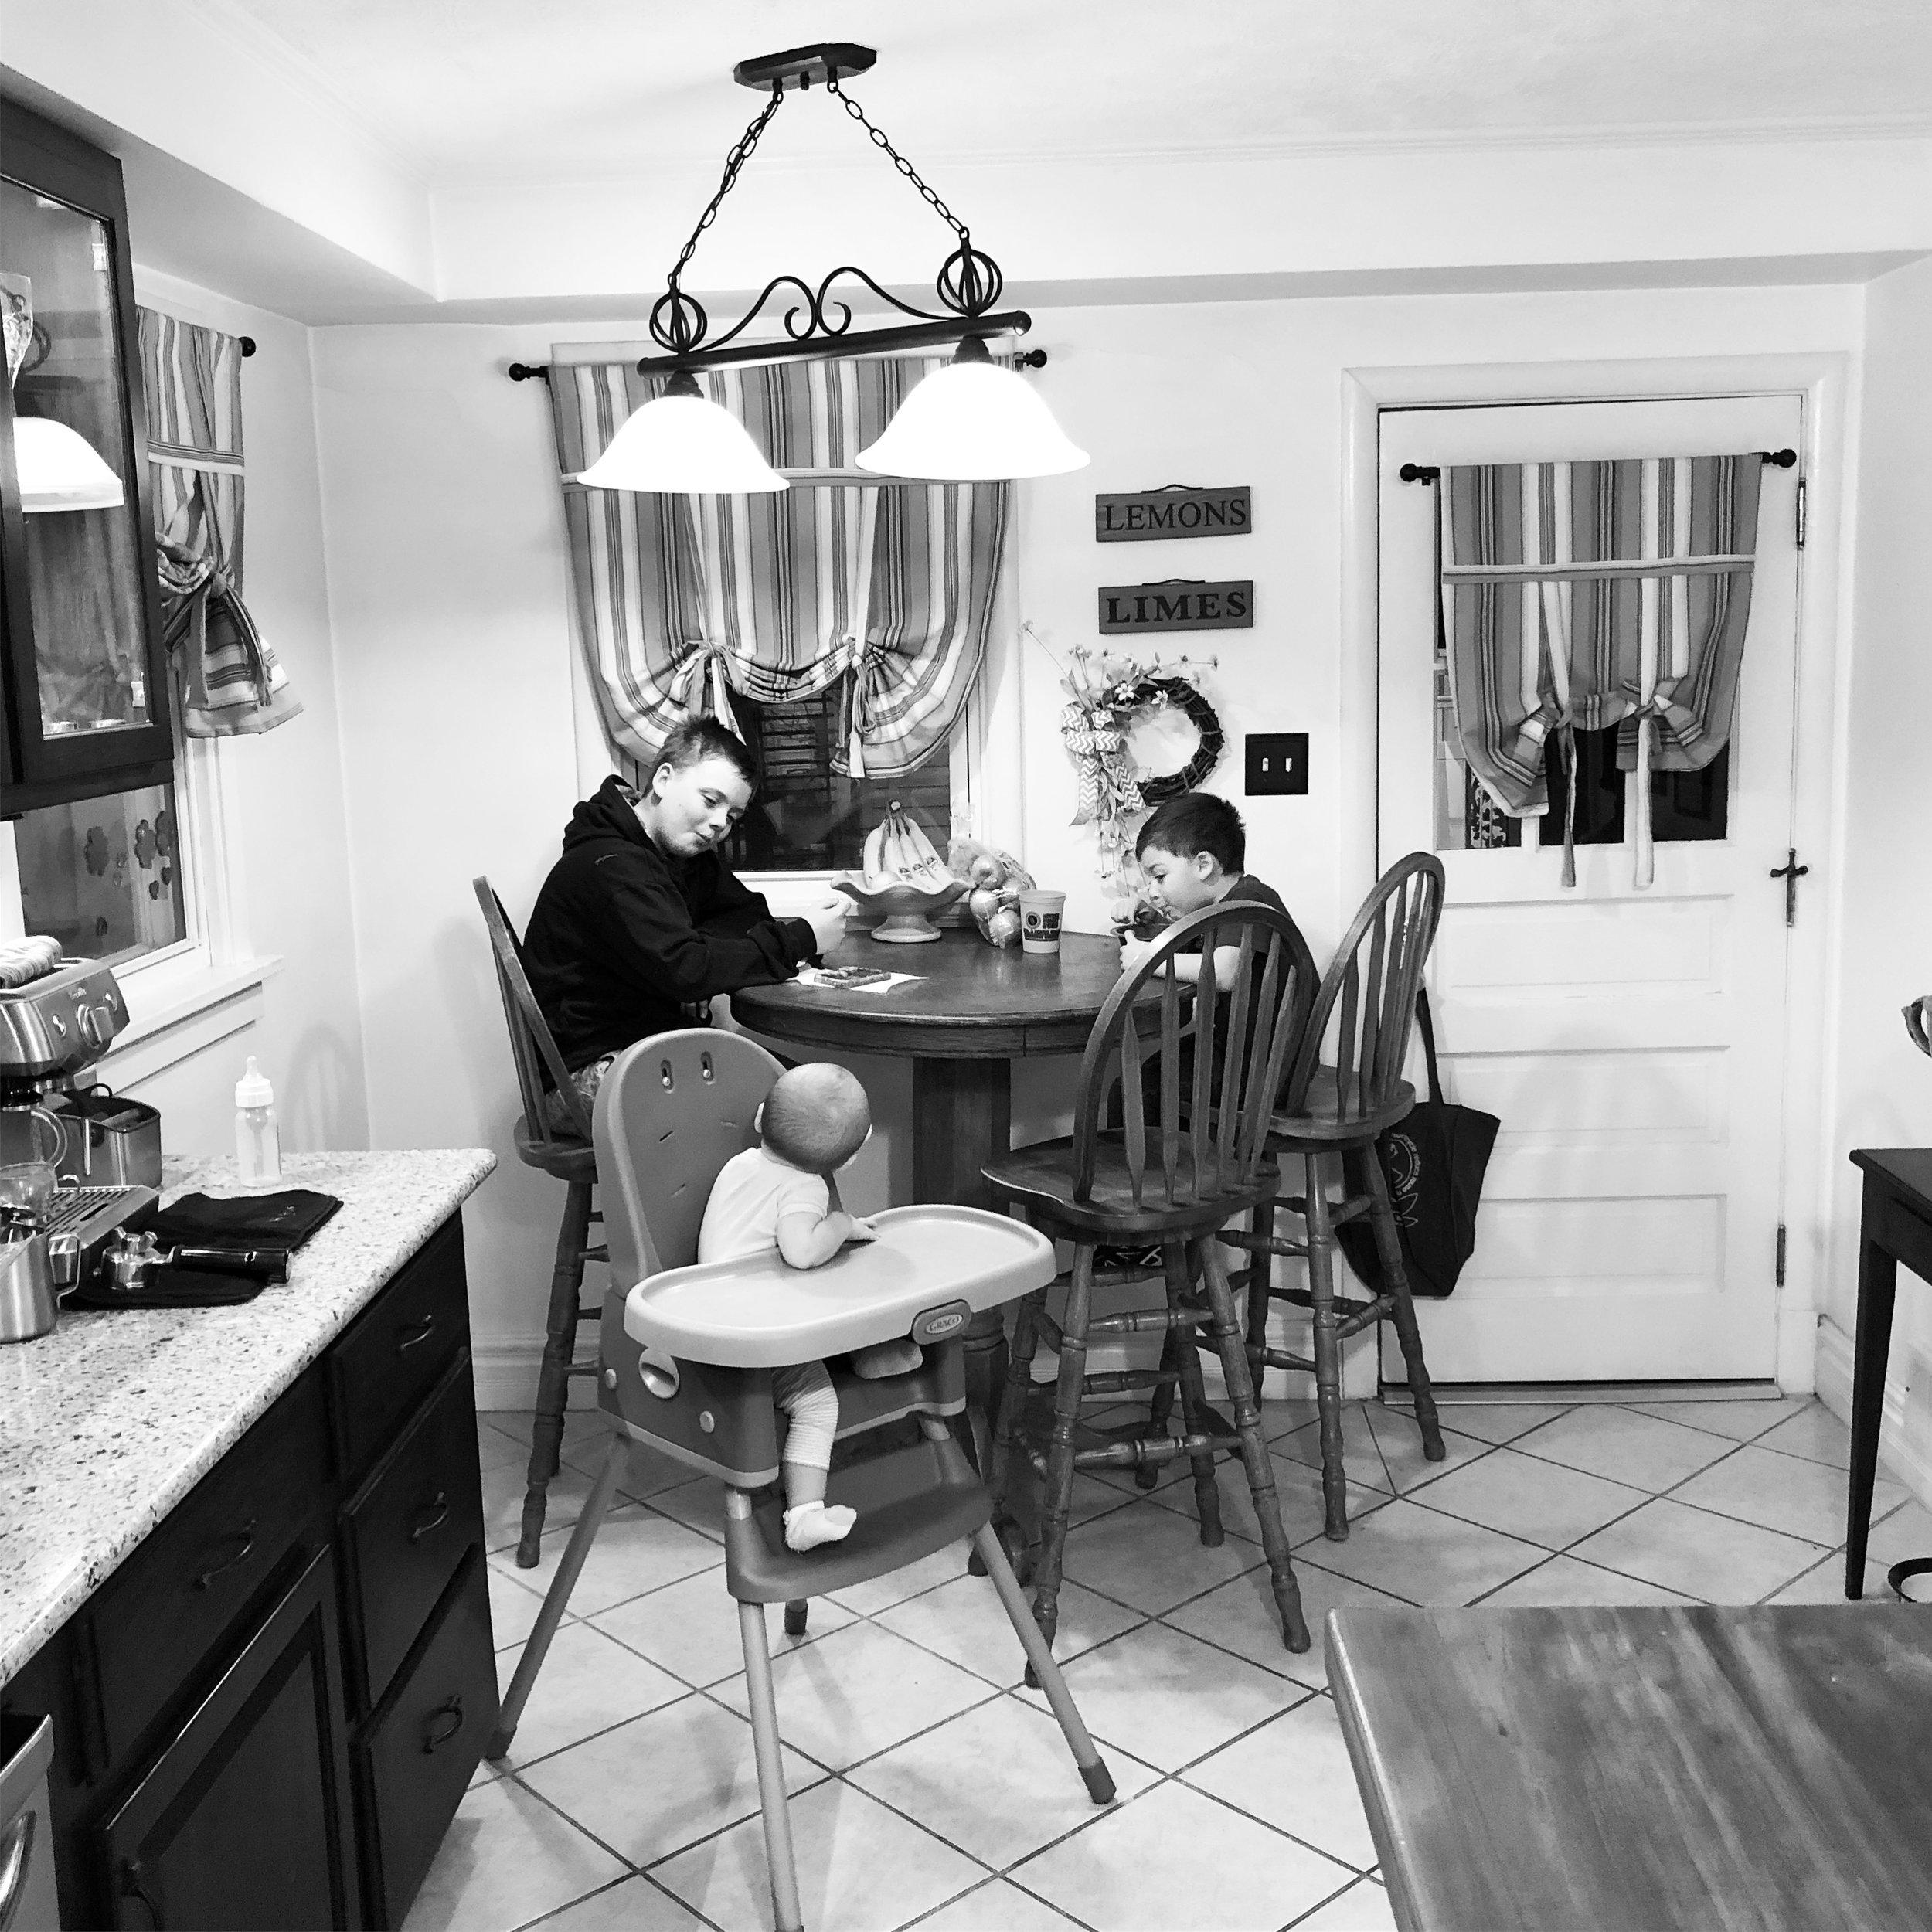 Family. Kids. Love. #koftwentytwo #familyphotography #son #daughter